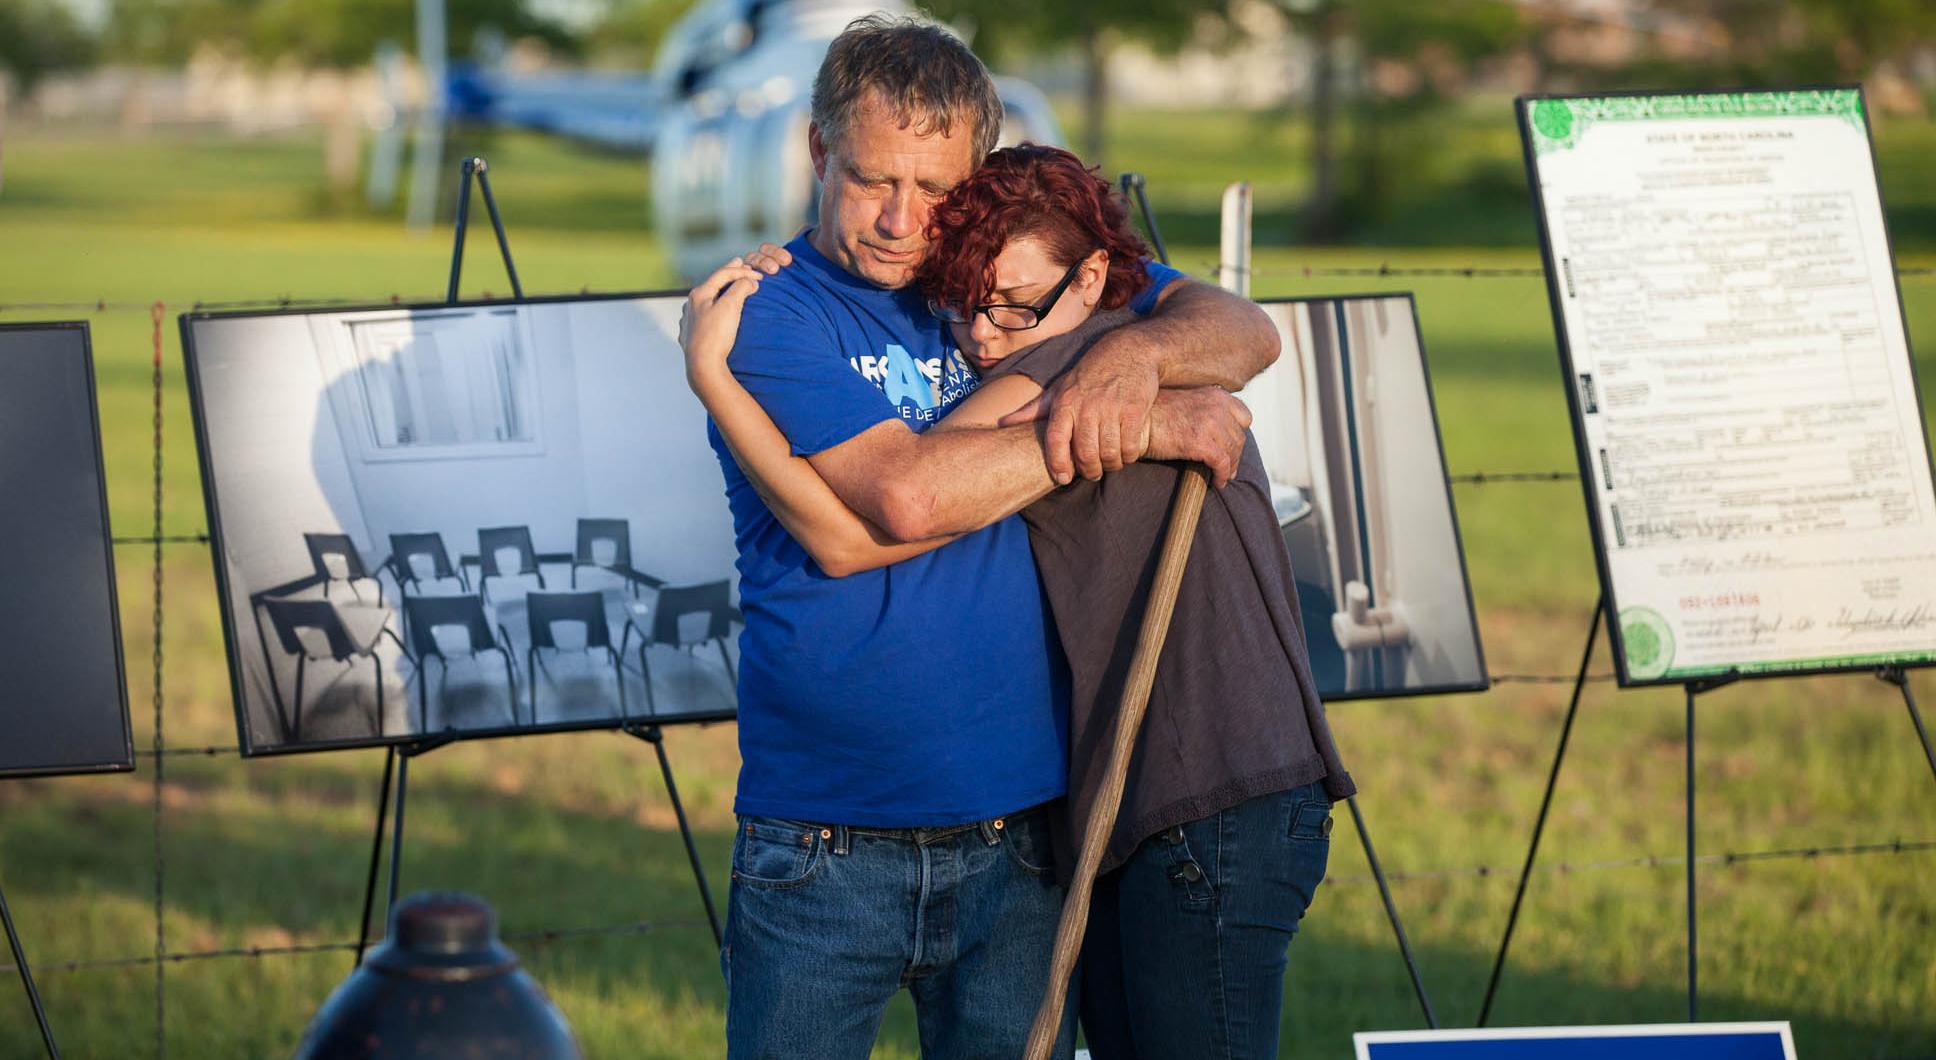 Arkansas executions photo essay